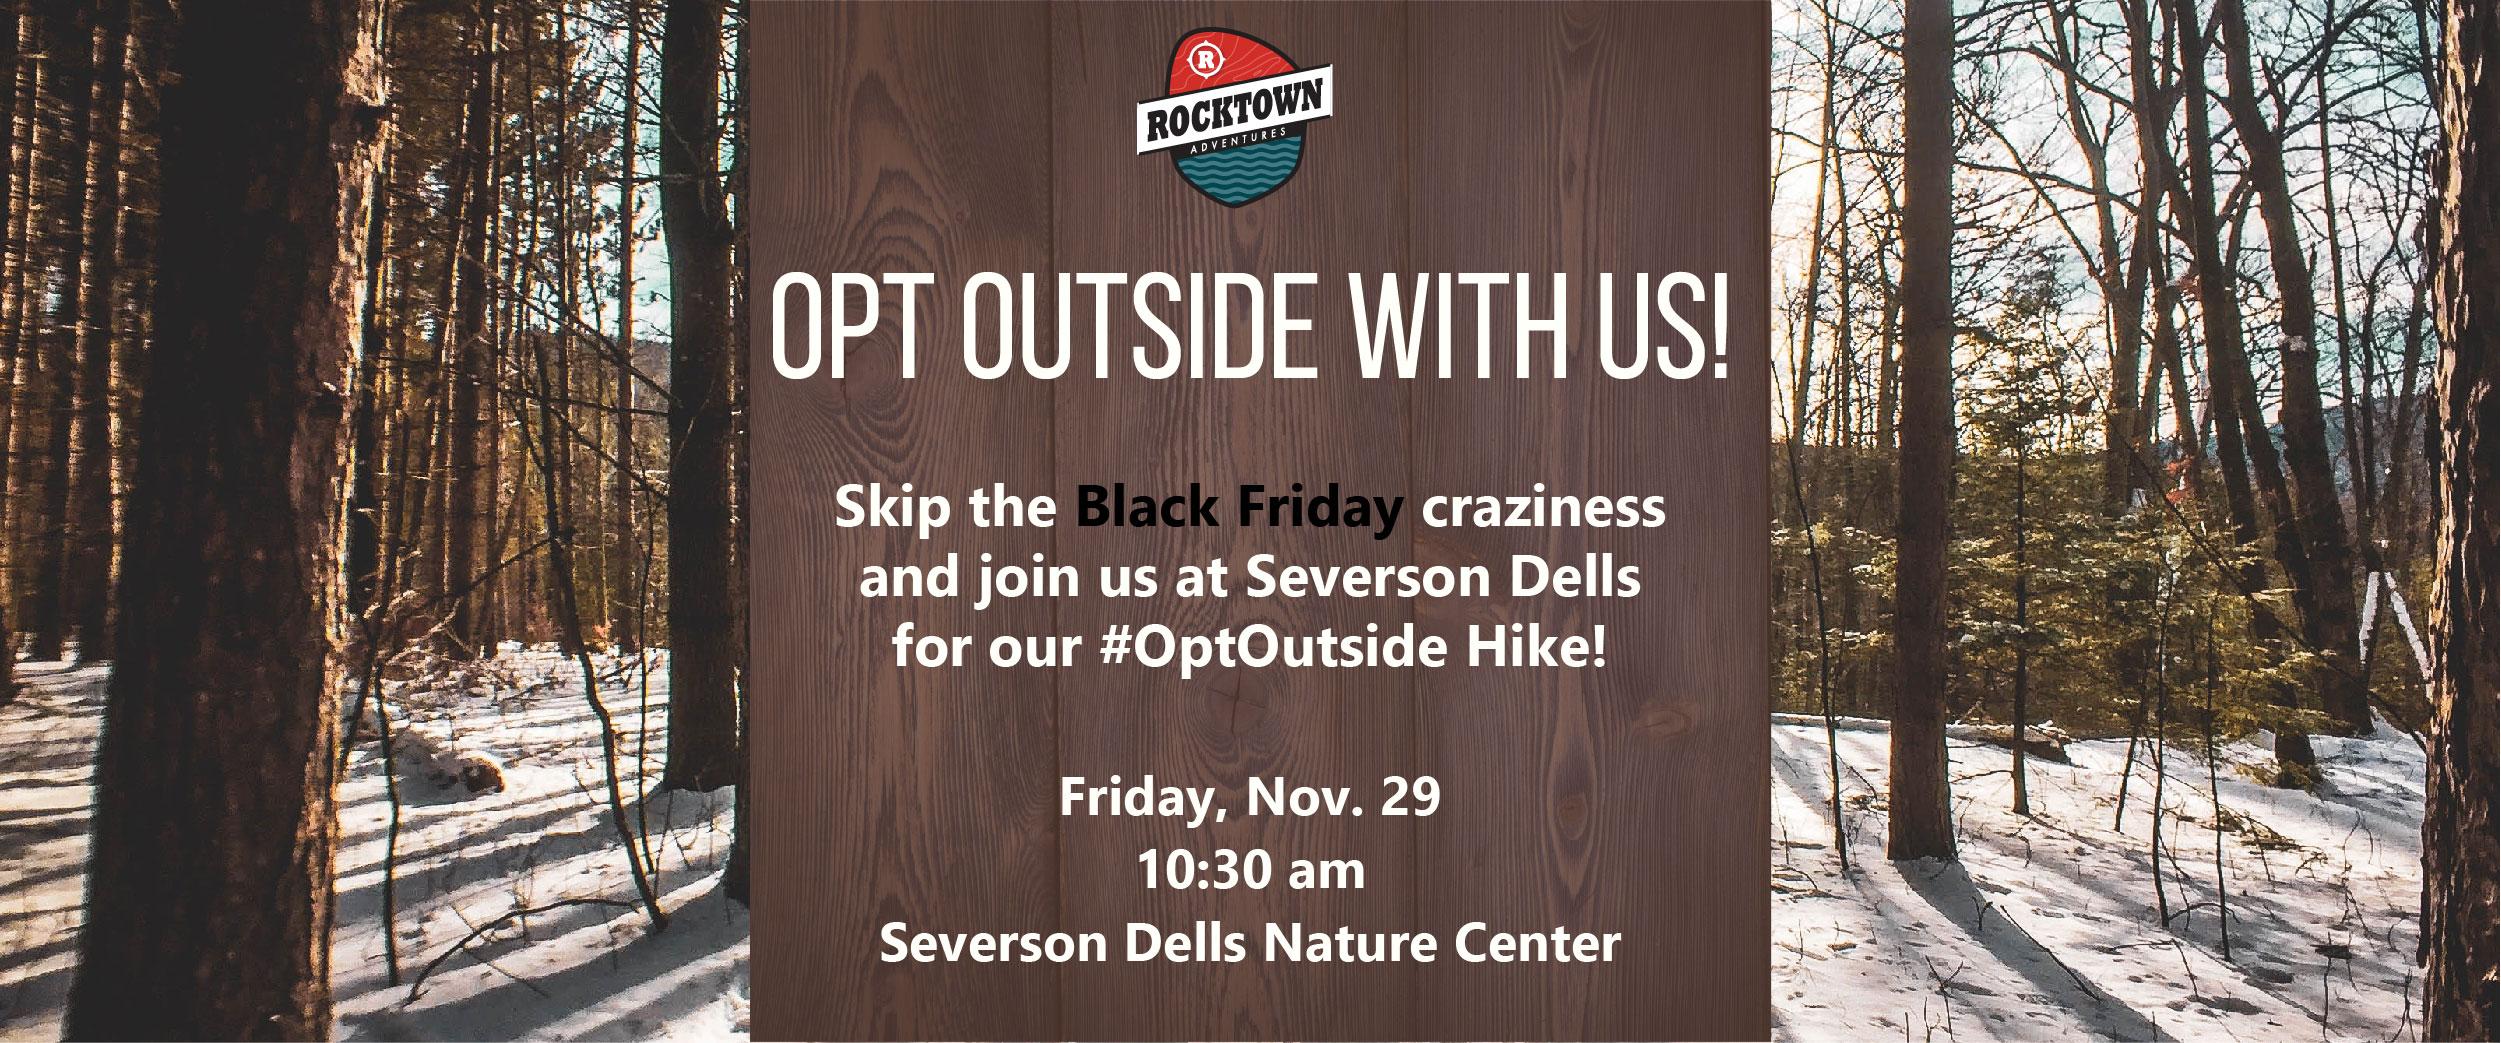 #OptOutside This Black Friday | Rocktown Adventures